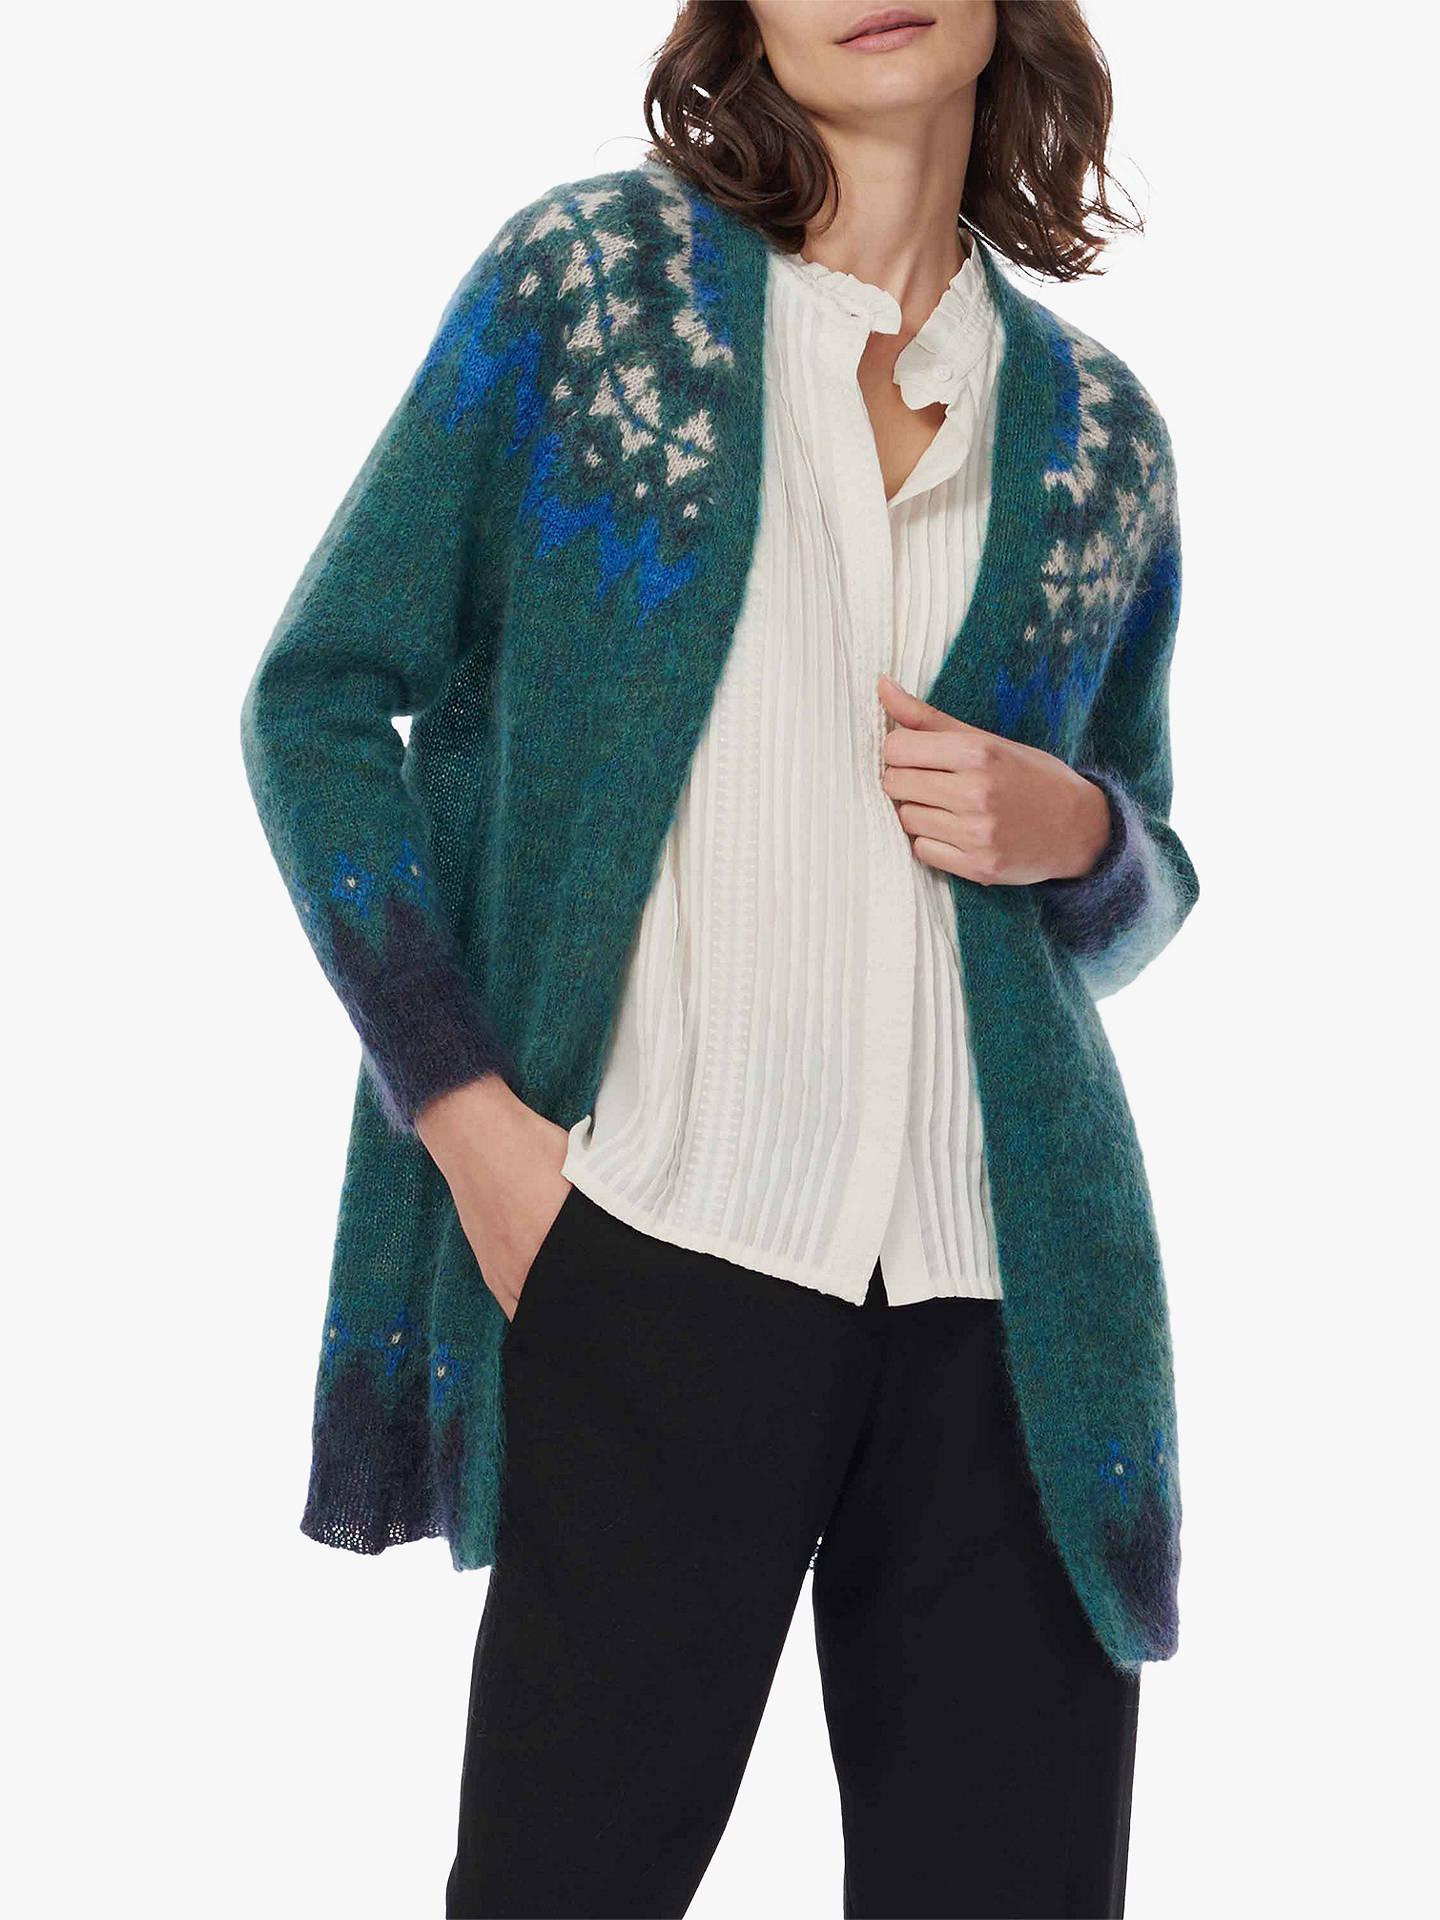 BuyBrora Mohair Icelandic Knit Cardigan e3261d588